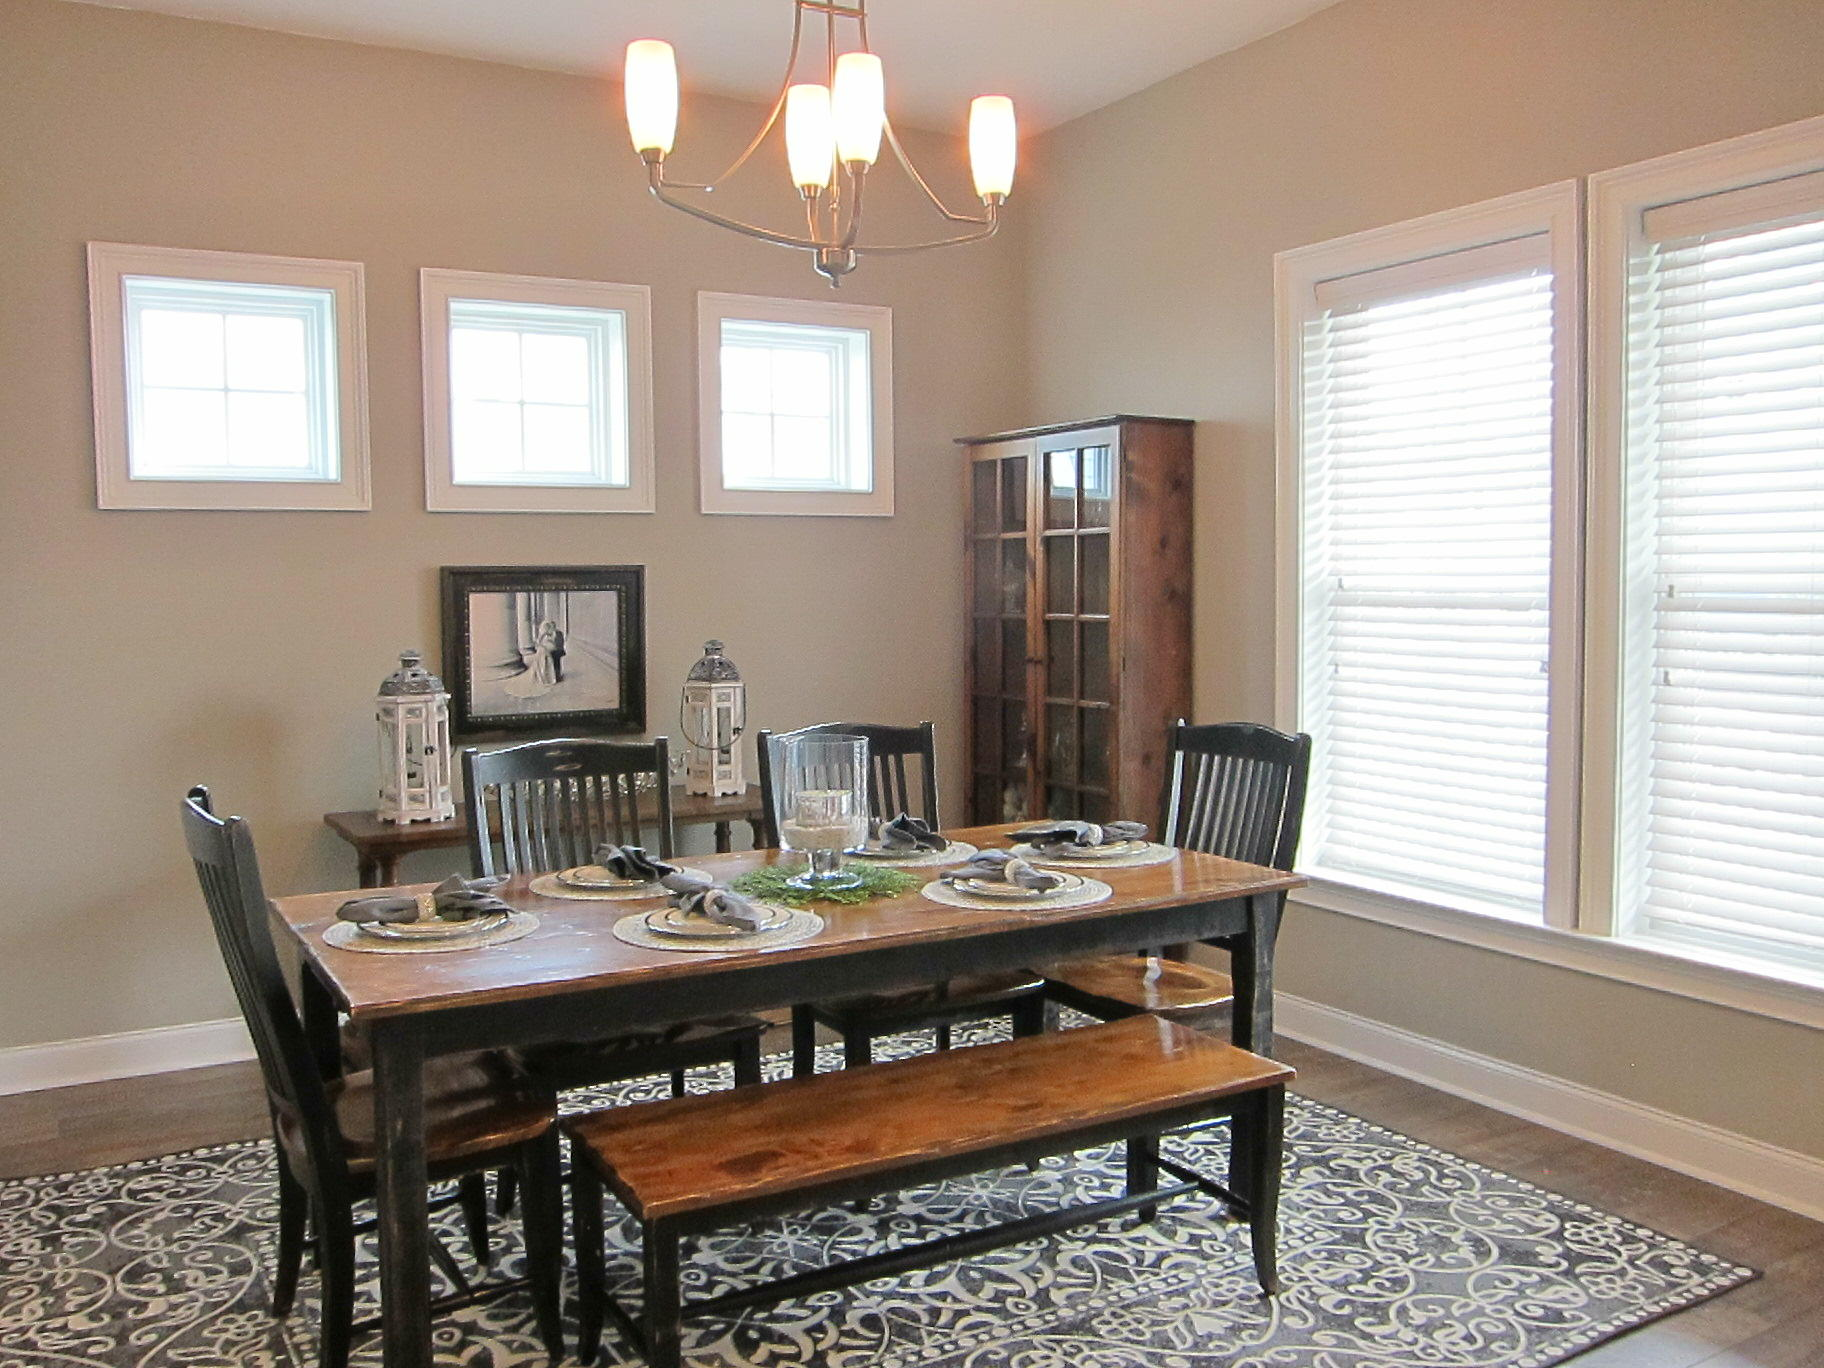 Carolina Park Homes For Sale - 3672 Shutesbury, Mount Pleasant, SC - 14